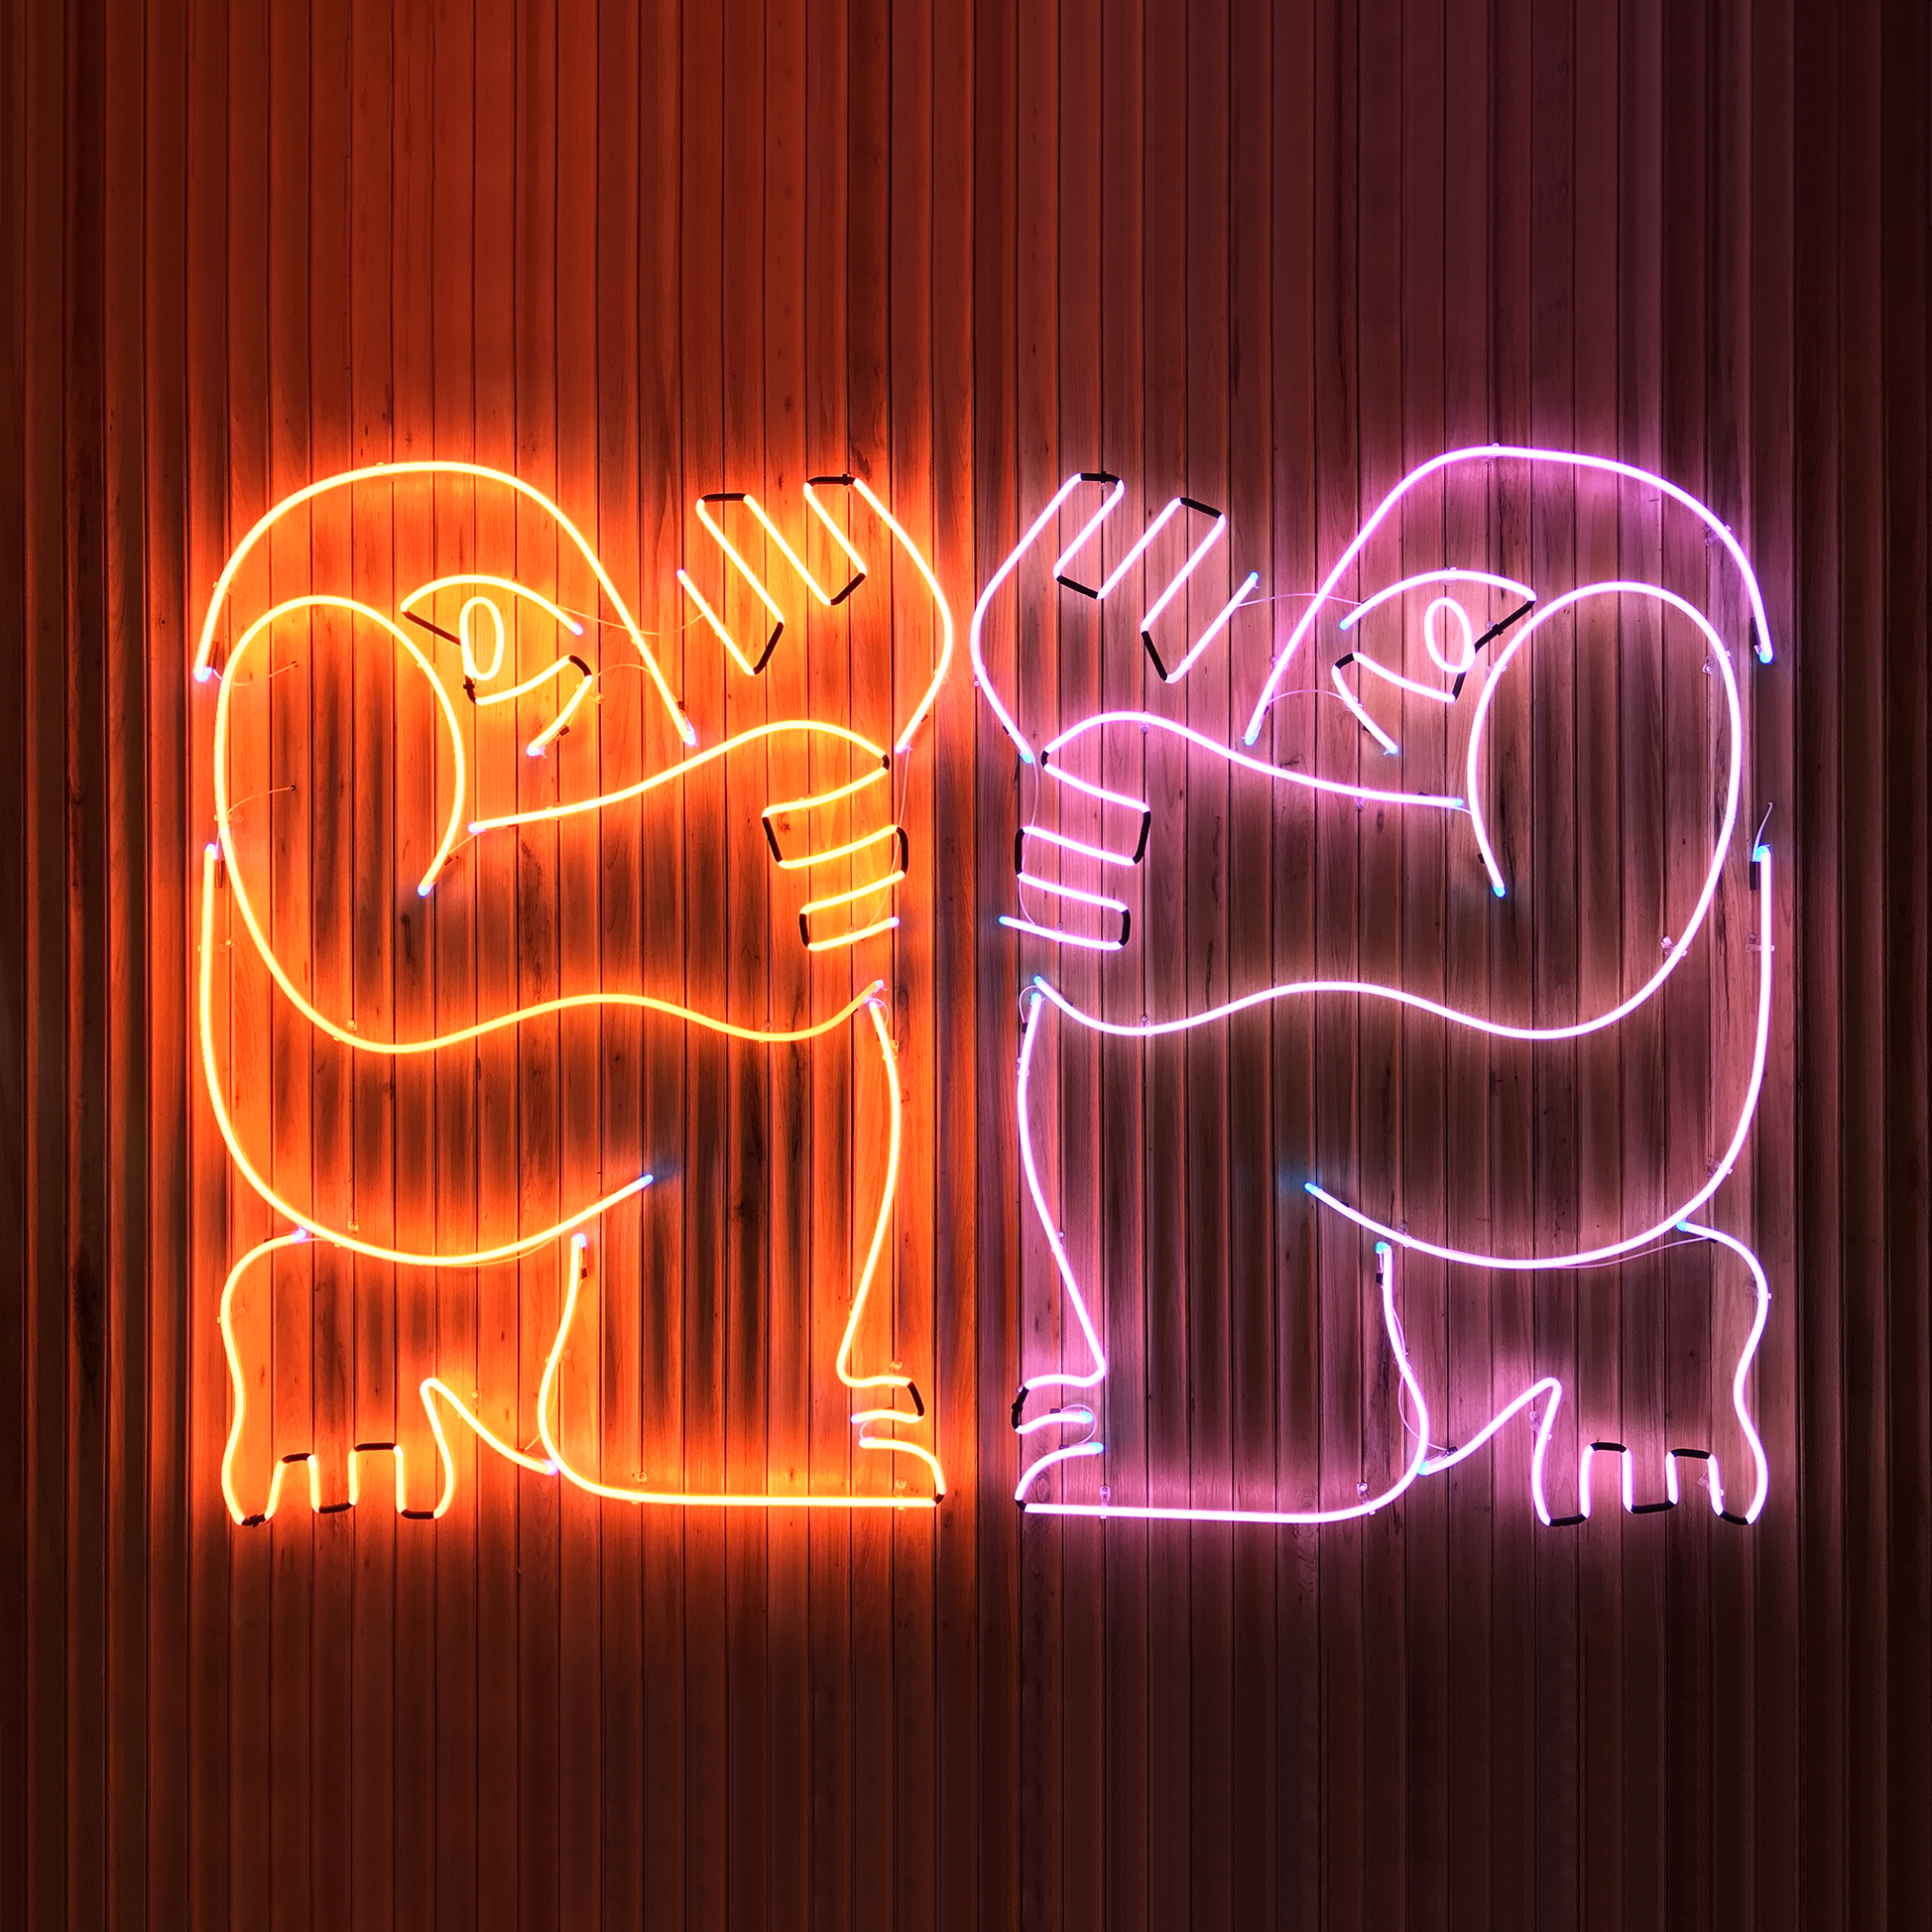 blobby-dudes-neon-1-small-ig.jpg